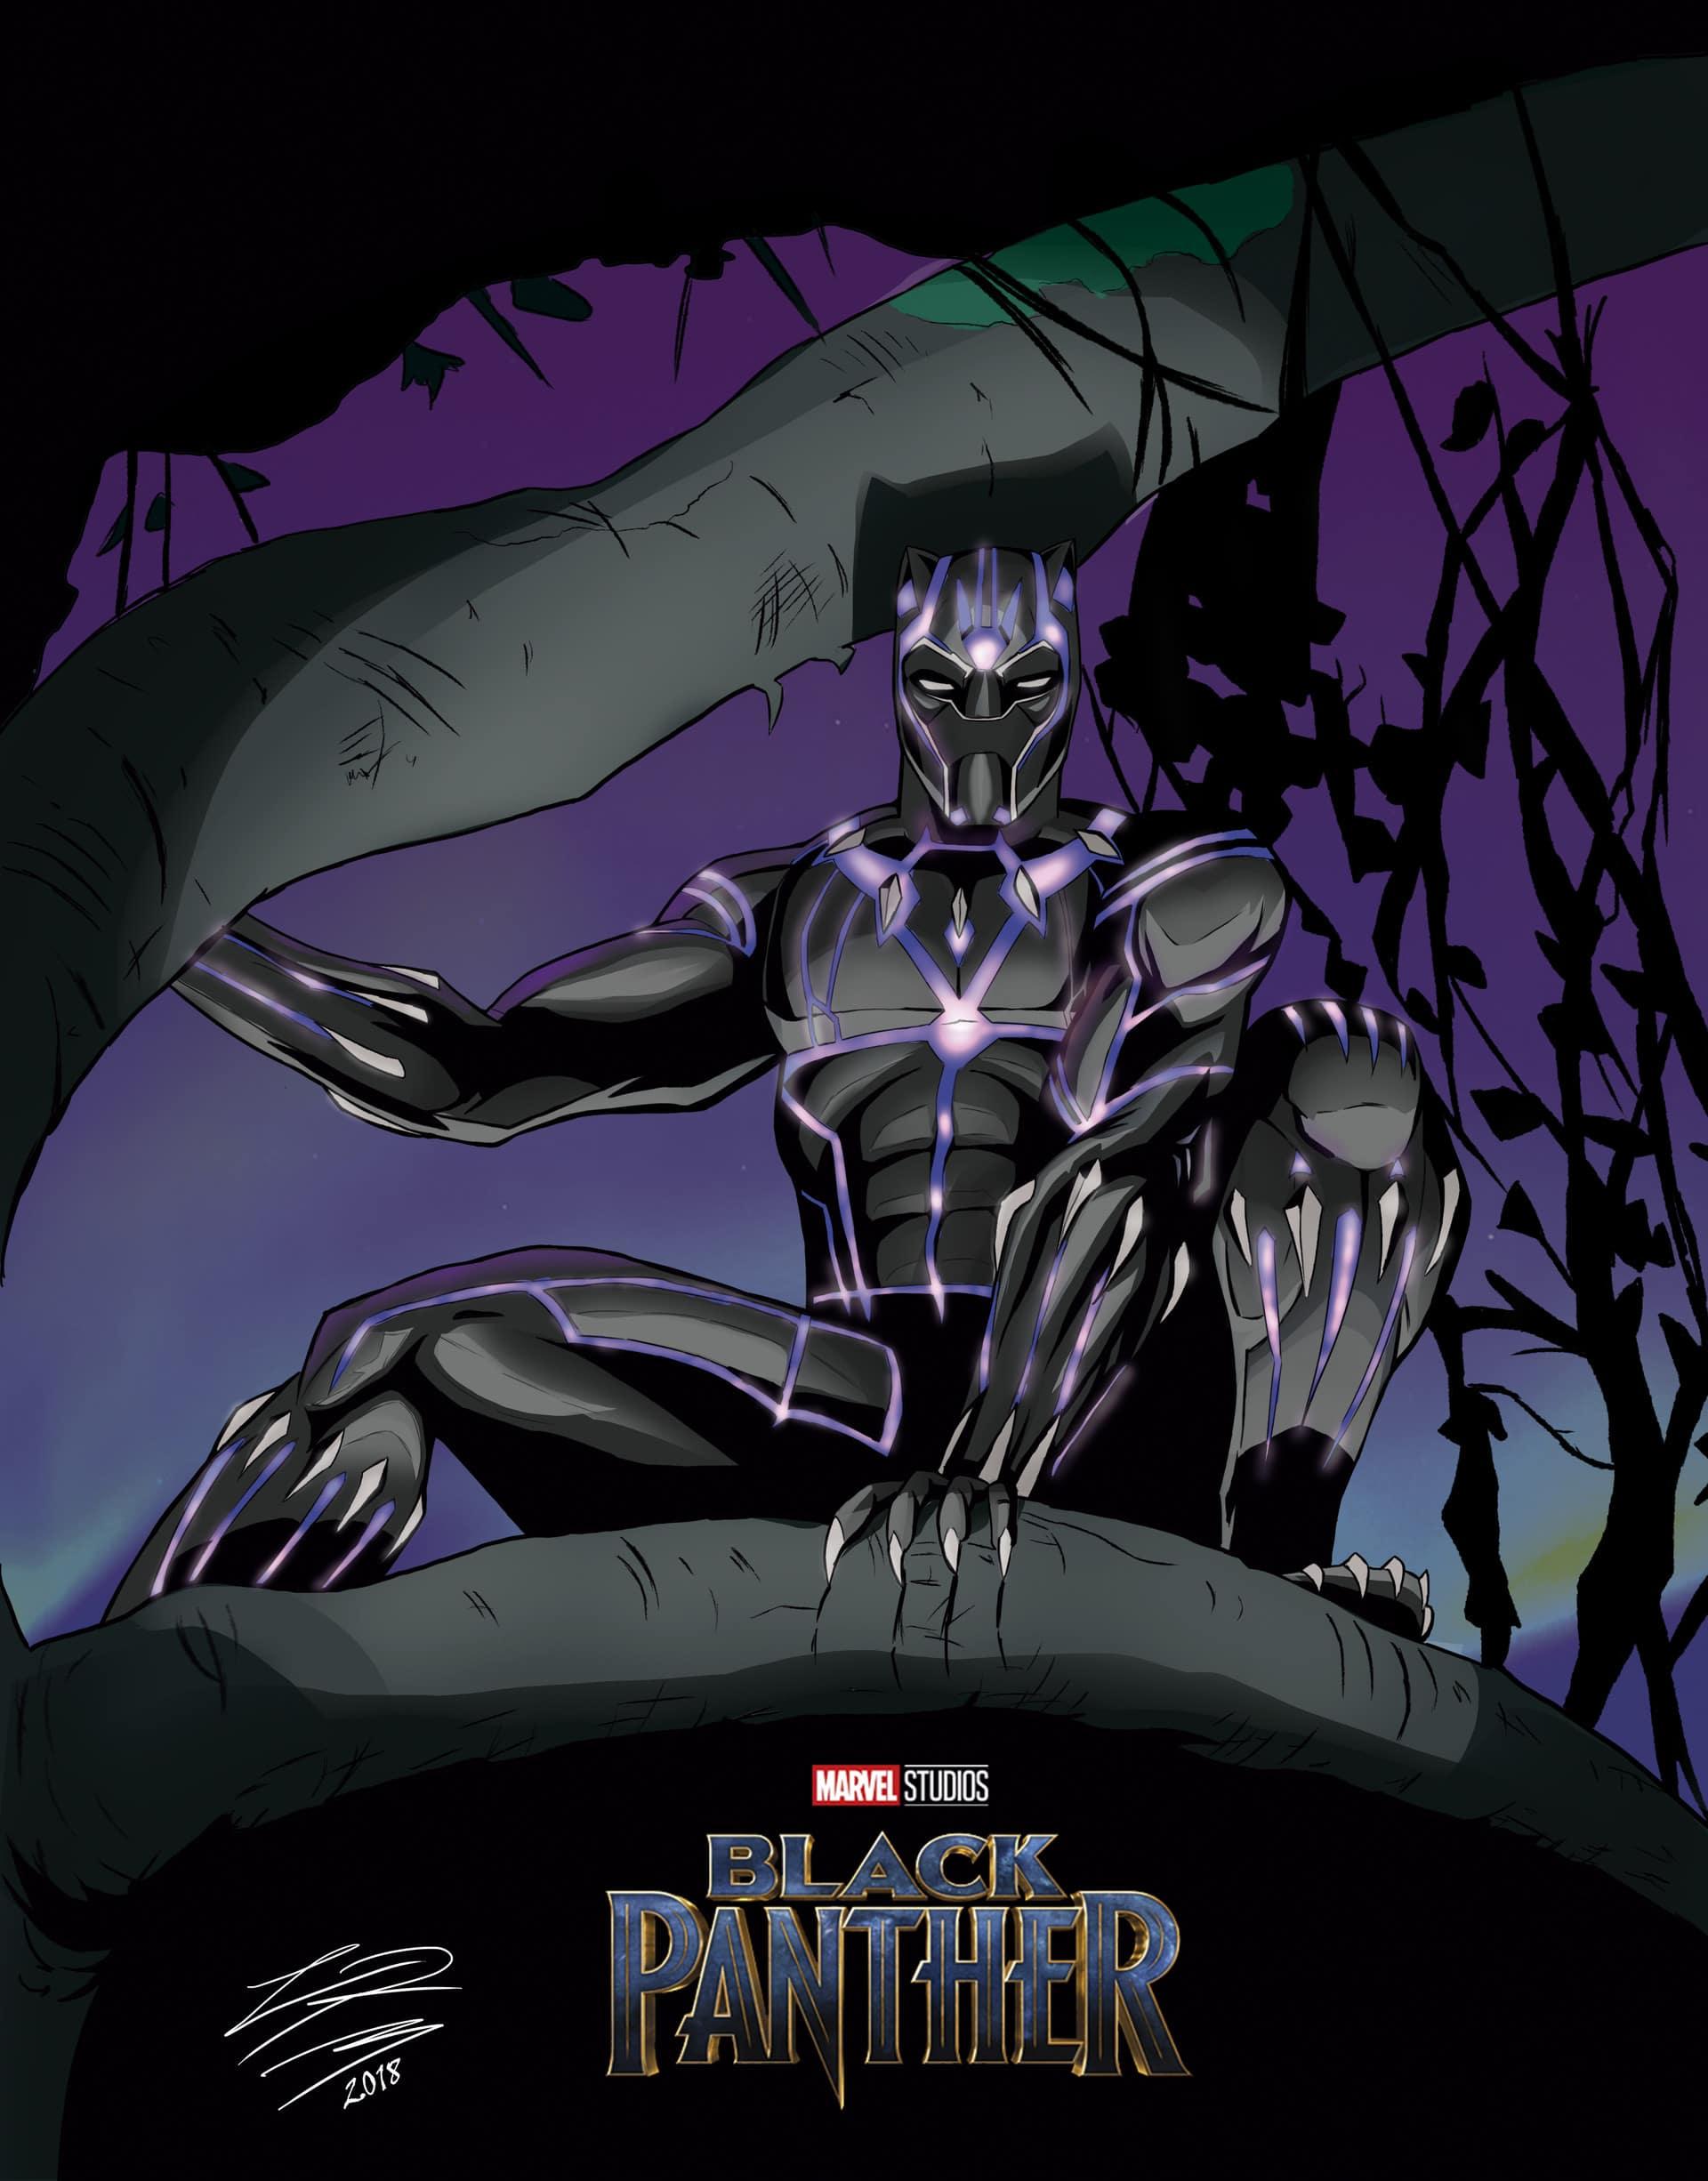 Black-Panther-hd-printable-Poster-hd-wallpaper-animation-cartoon-art